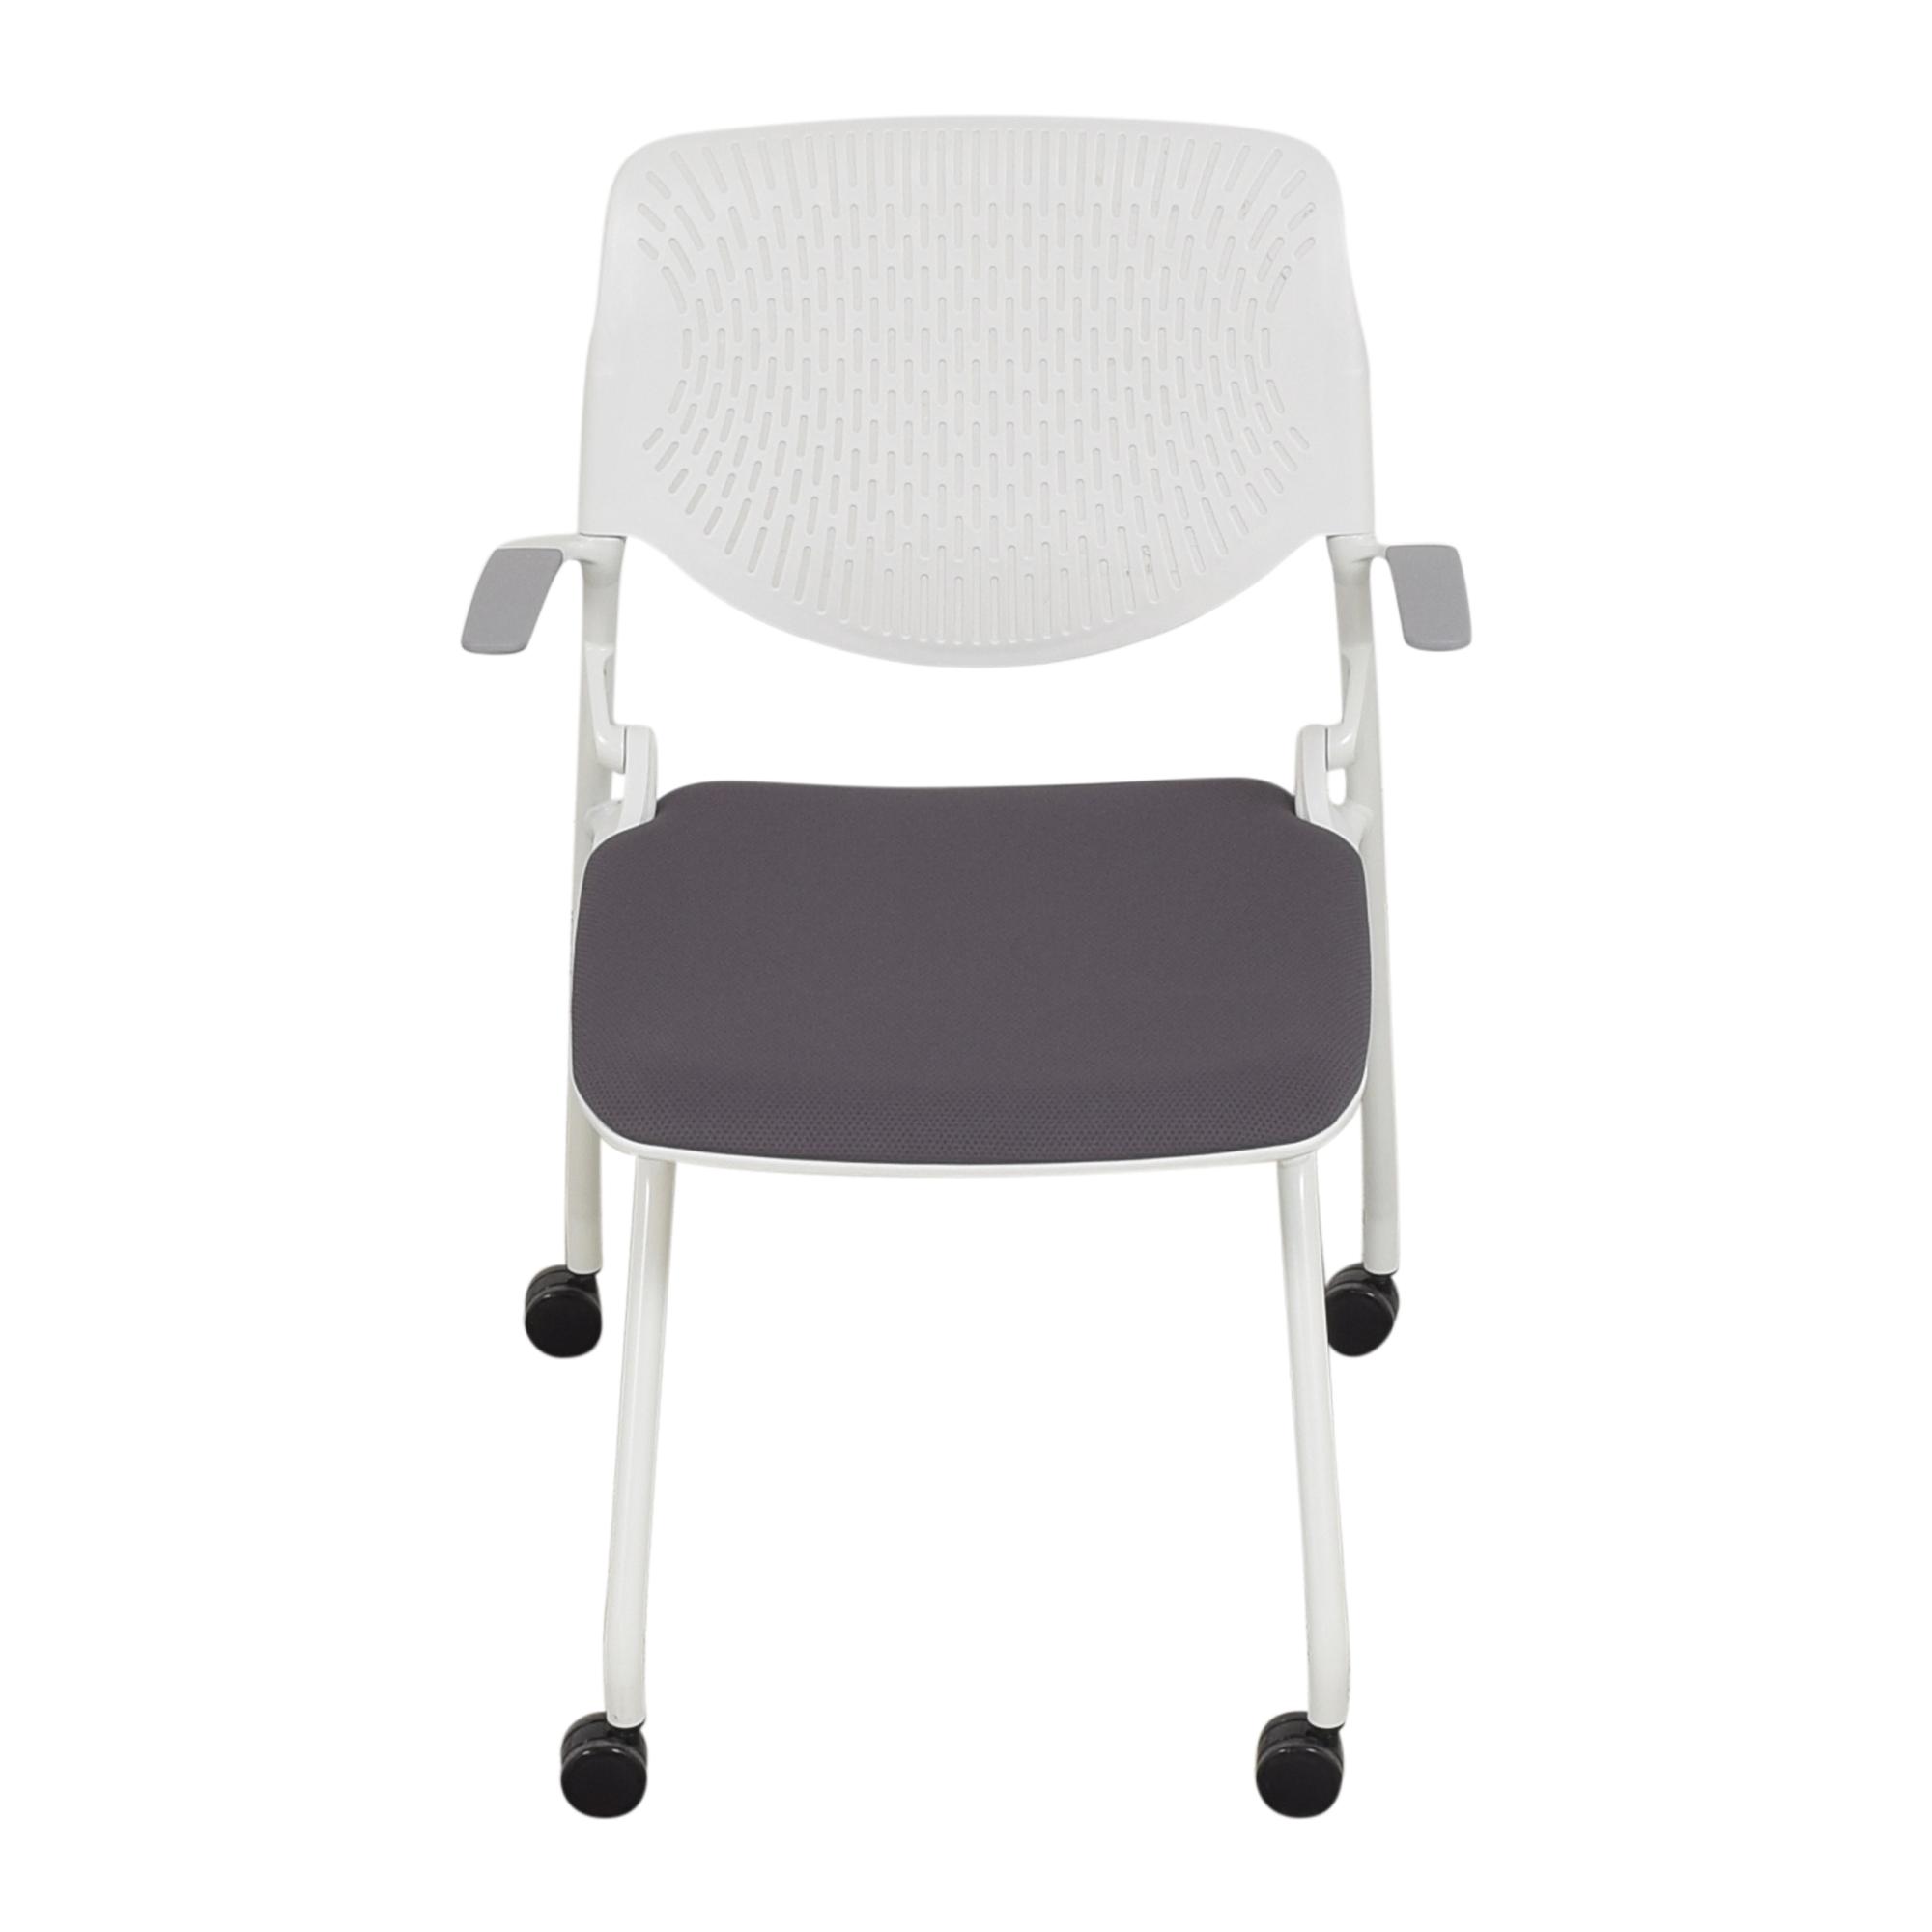 Room & Board Room & Board Runa Nesting Chair by Okamura on sale